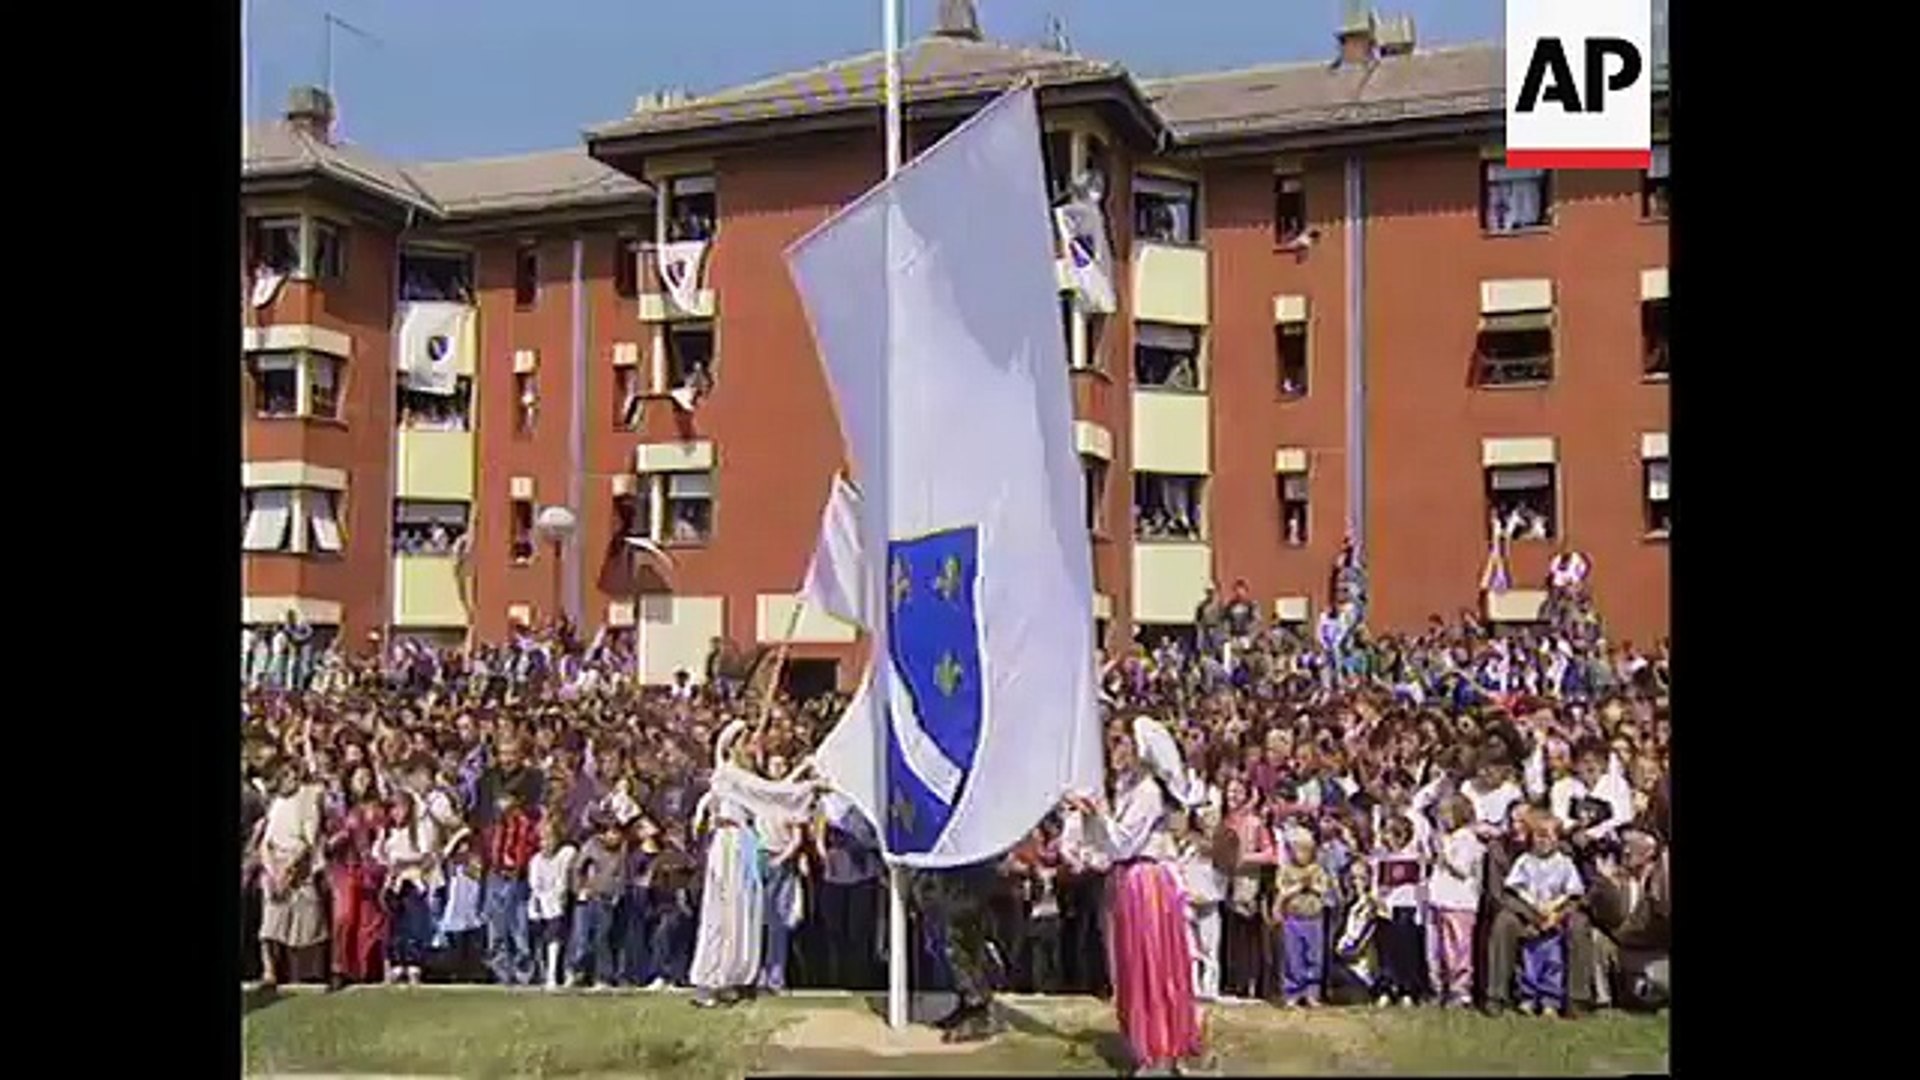 BOSNIA-  4TH ANNIVERSARY OF BOSNIAN ARMY MILITARY PARADE